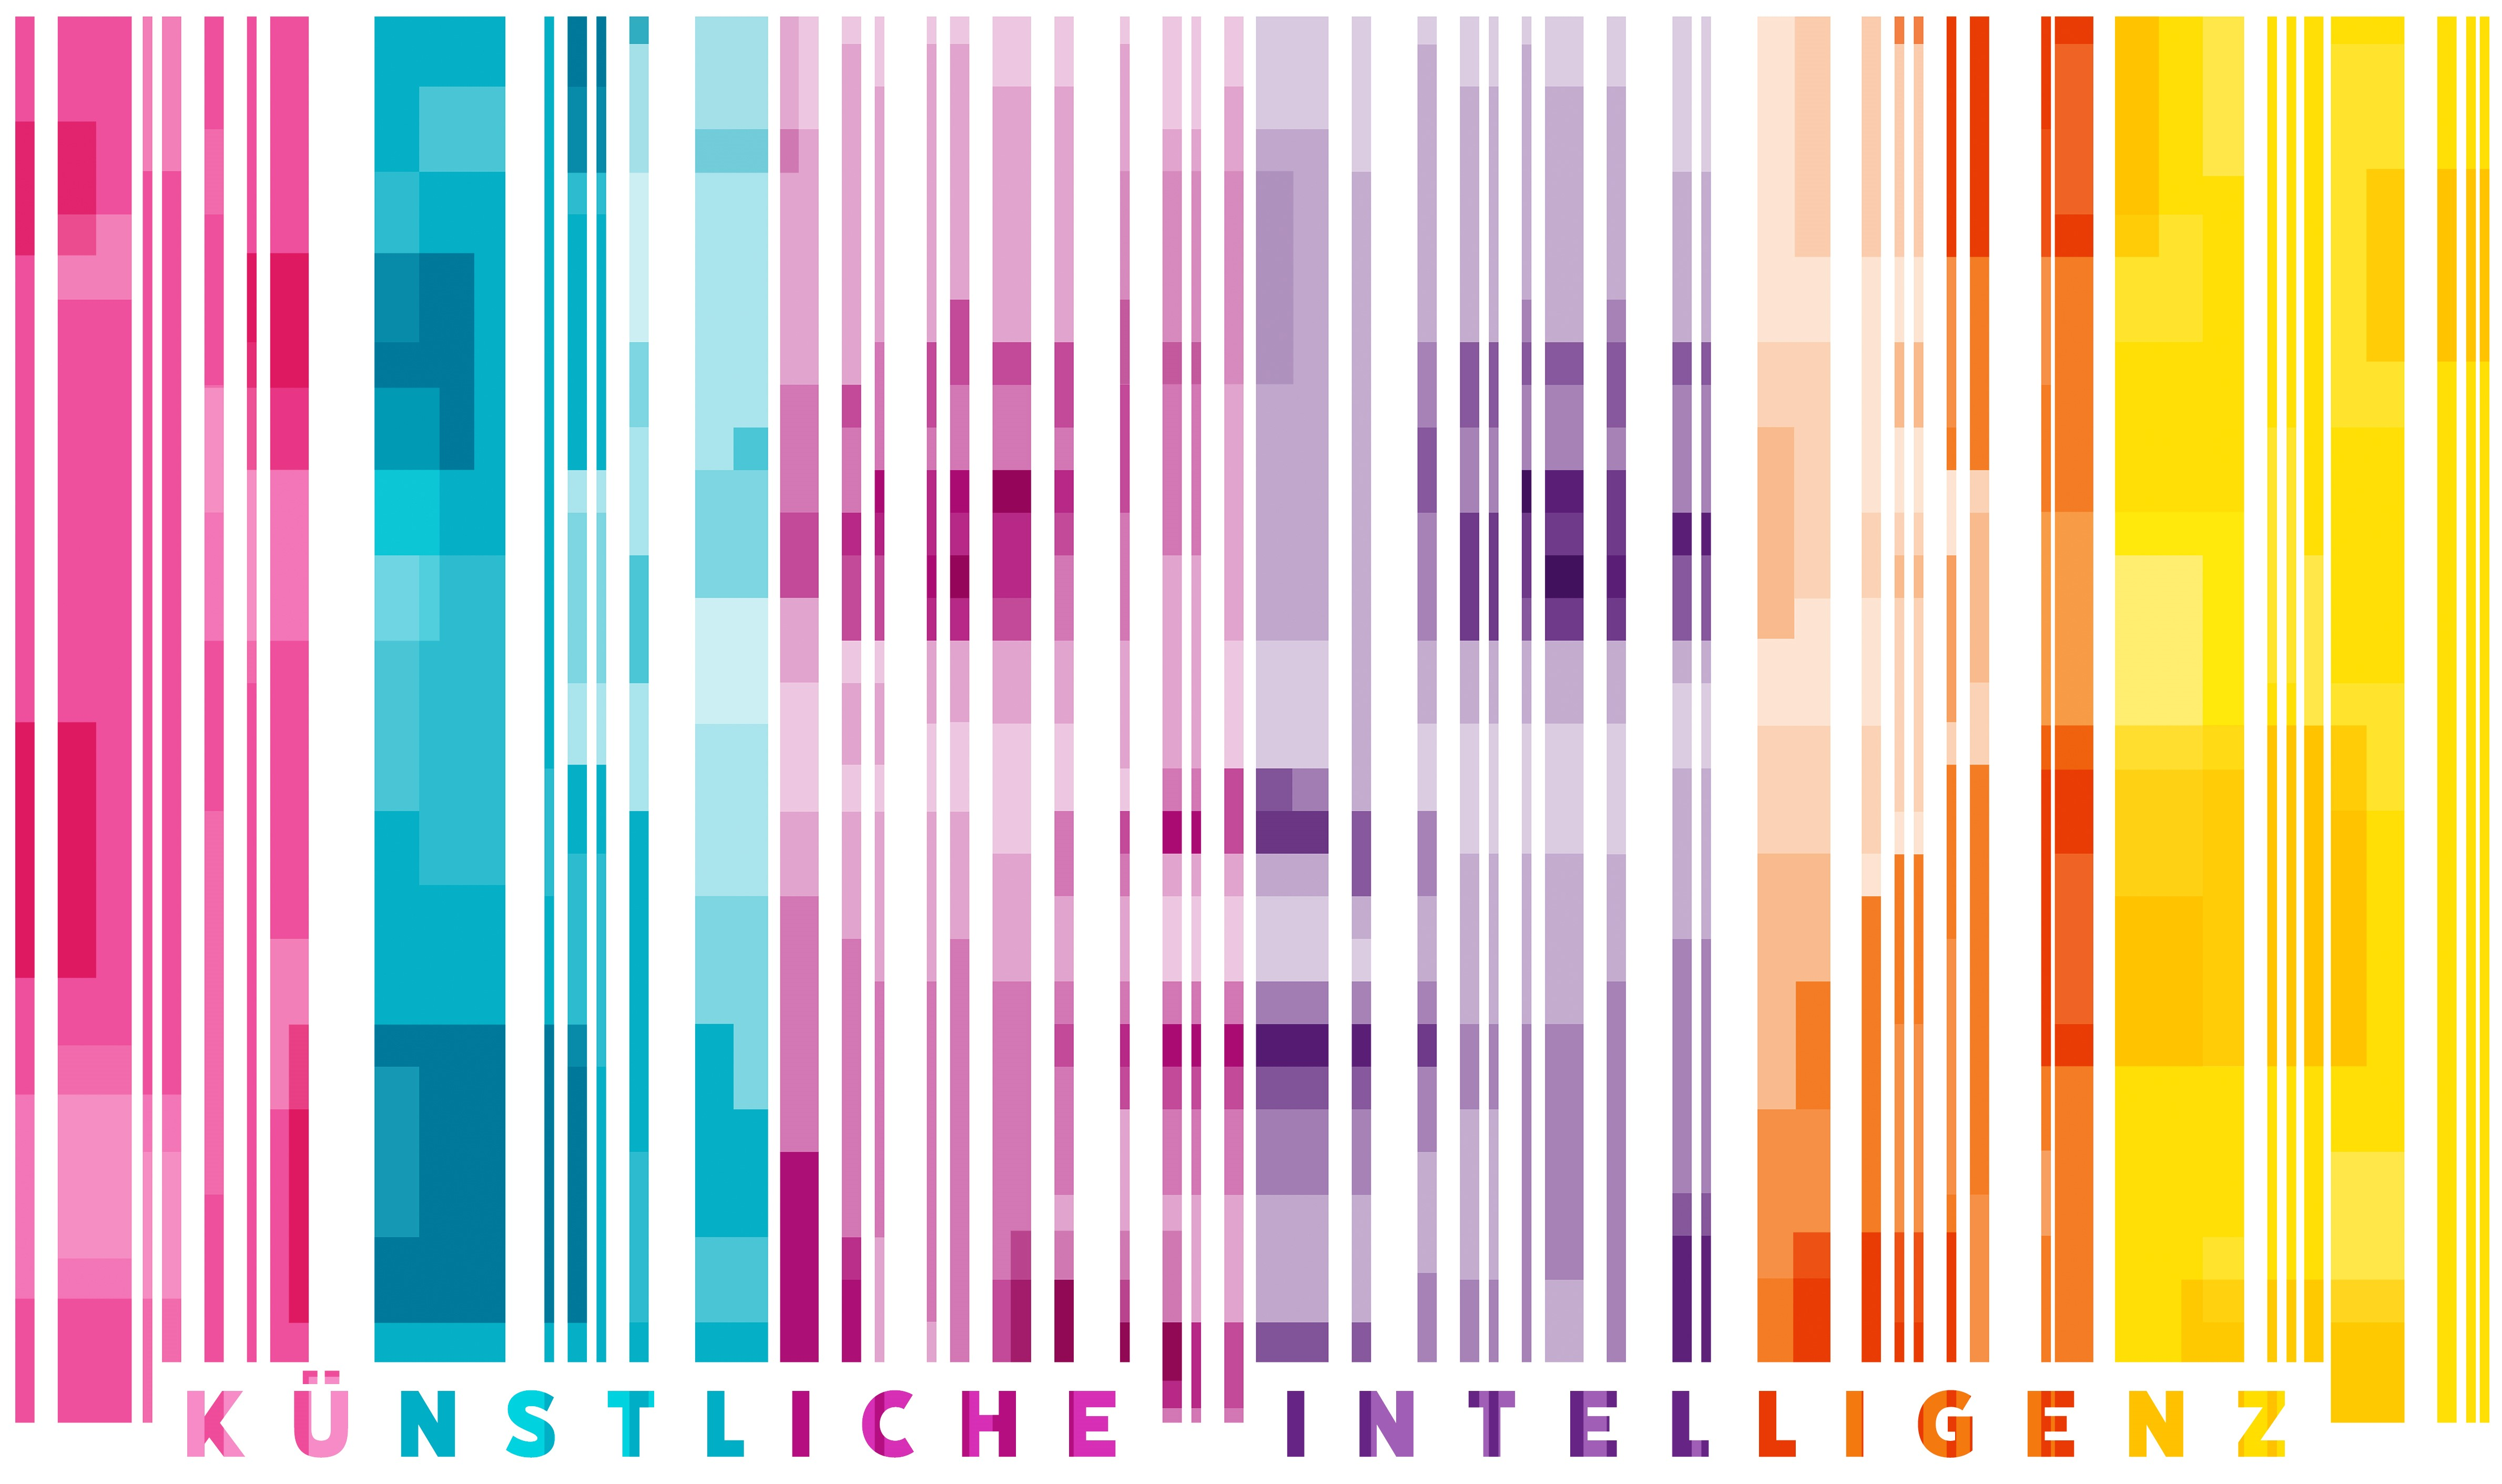 Artificial intelligence? An exhibition at the Technisches Museum Wien